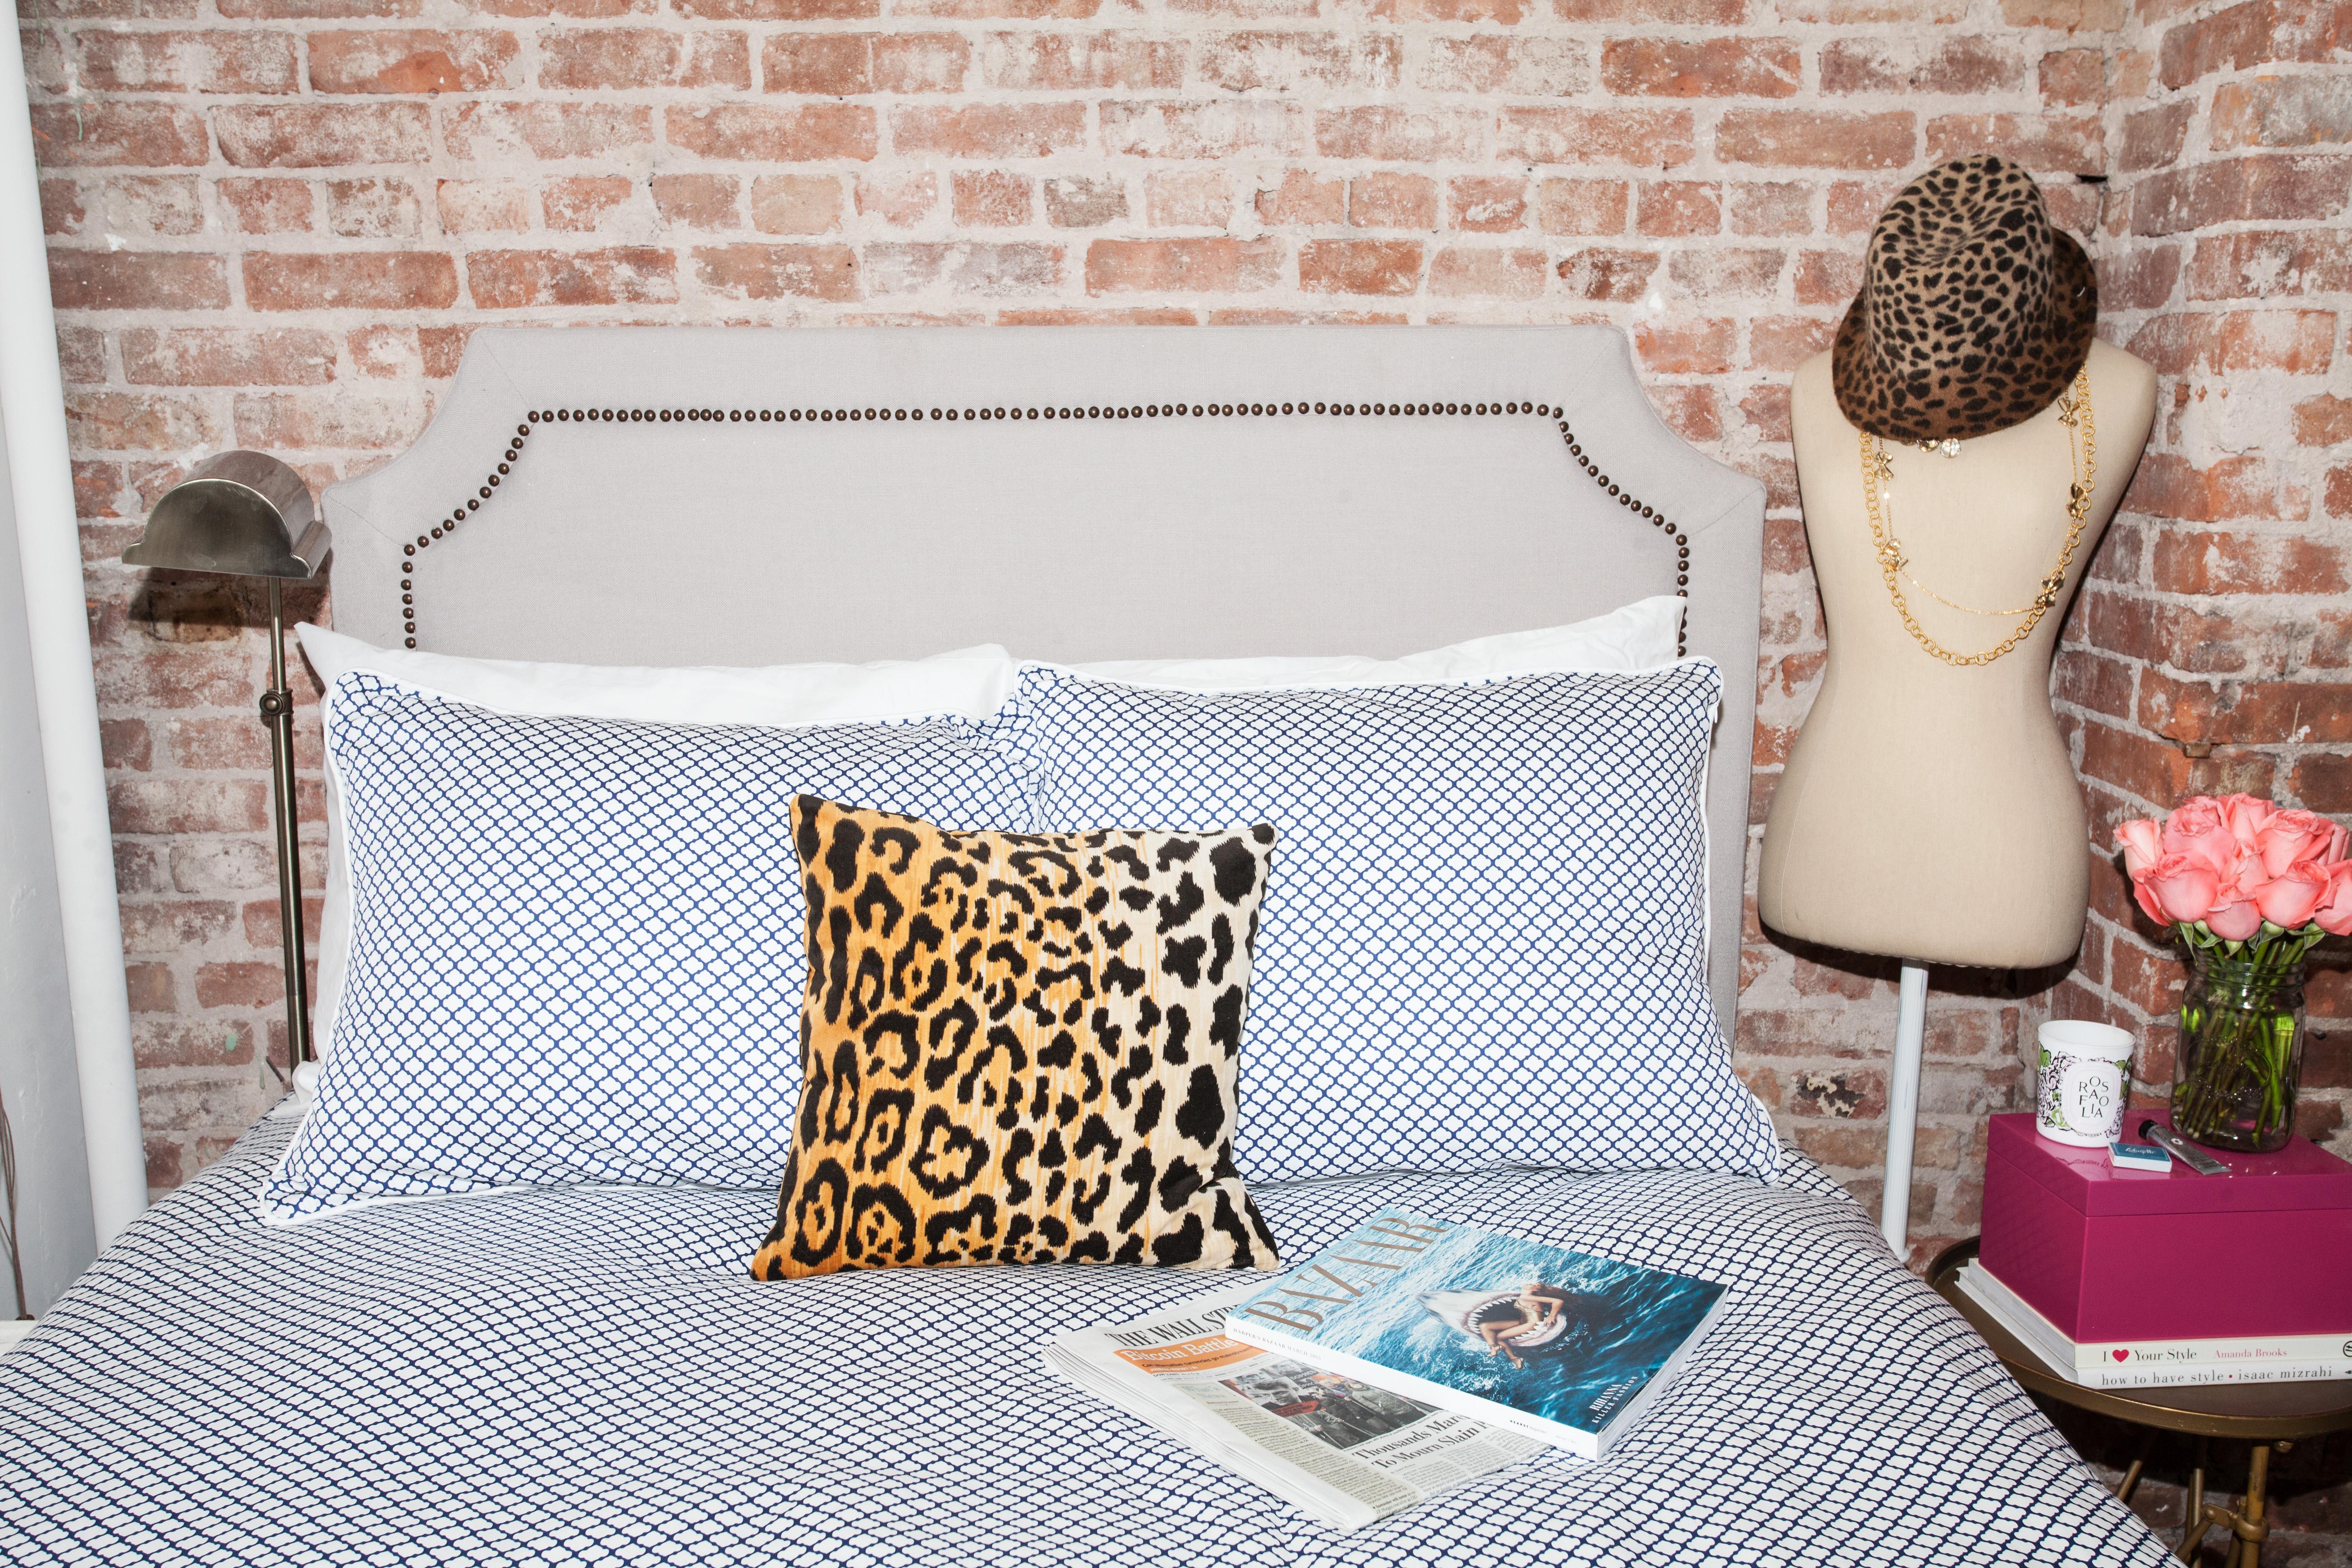 Nyc Bedroom Decor Ideas Bows Sequins